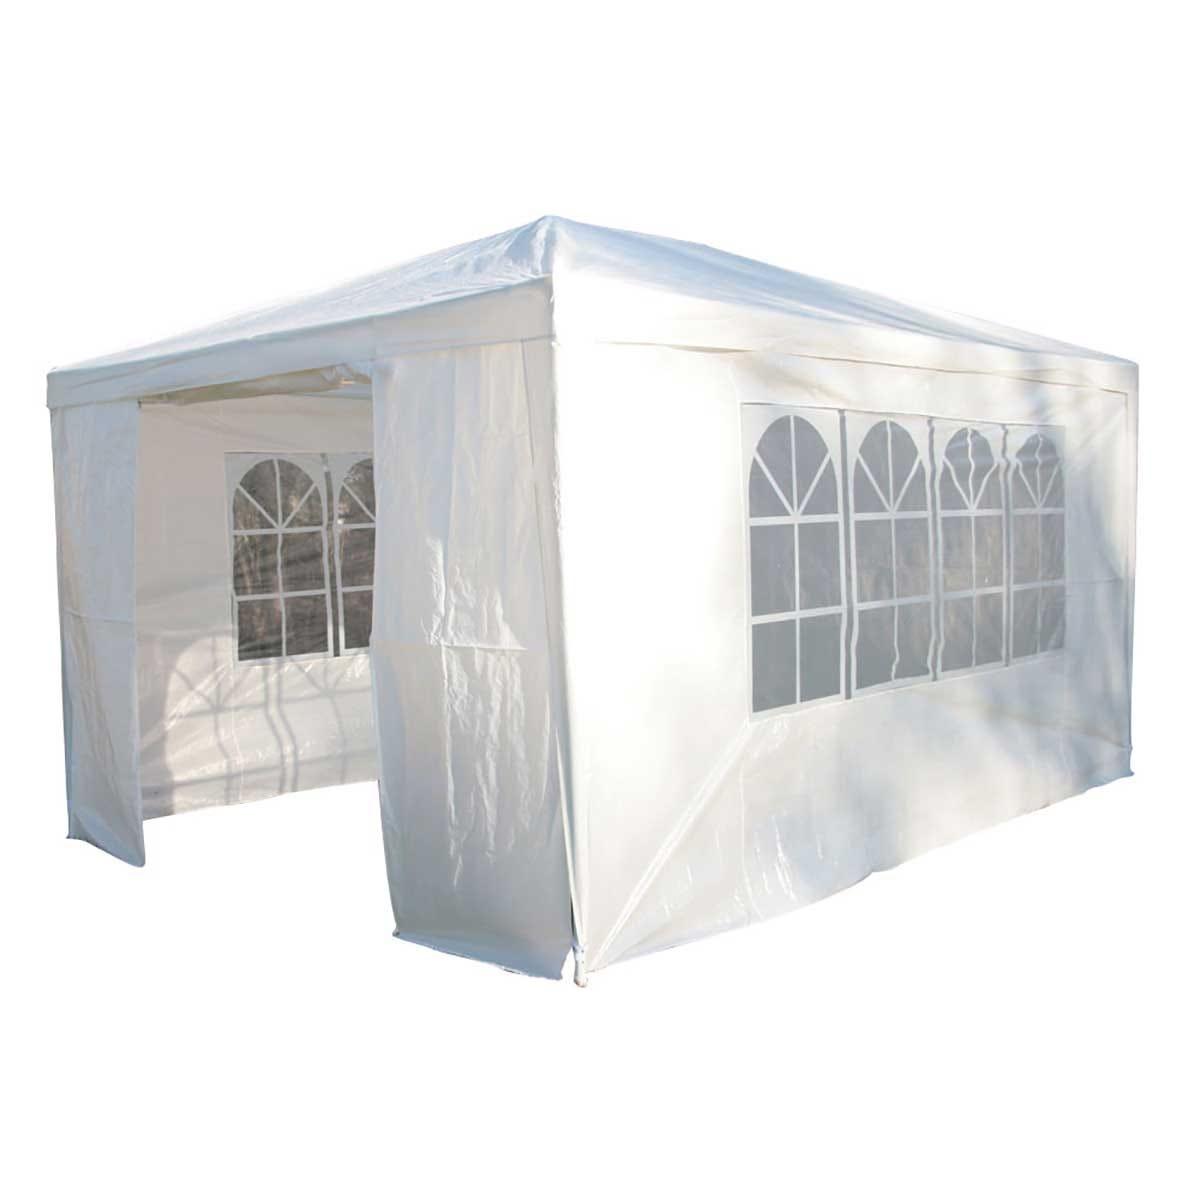 Airwave 4m x 3m Value Party Gazebo Tent - White